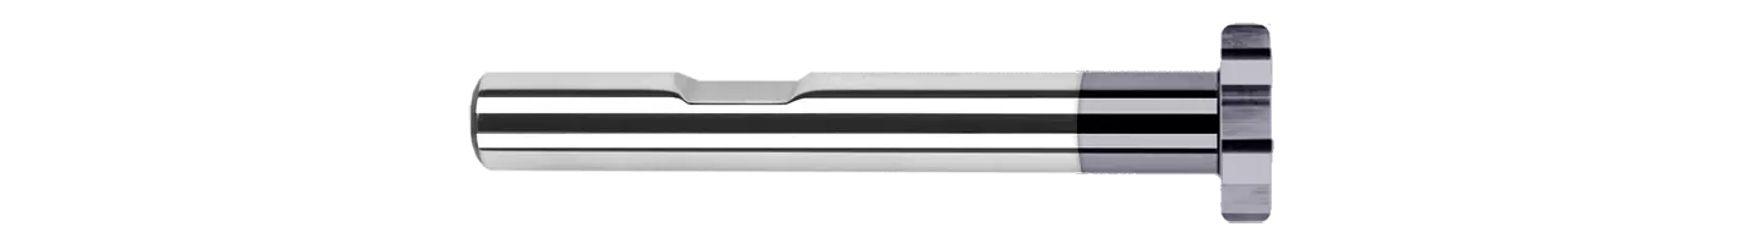 Keyseat Cutters - Corner Radius - Reduced Shank